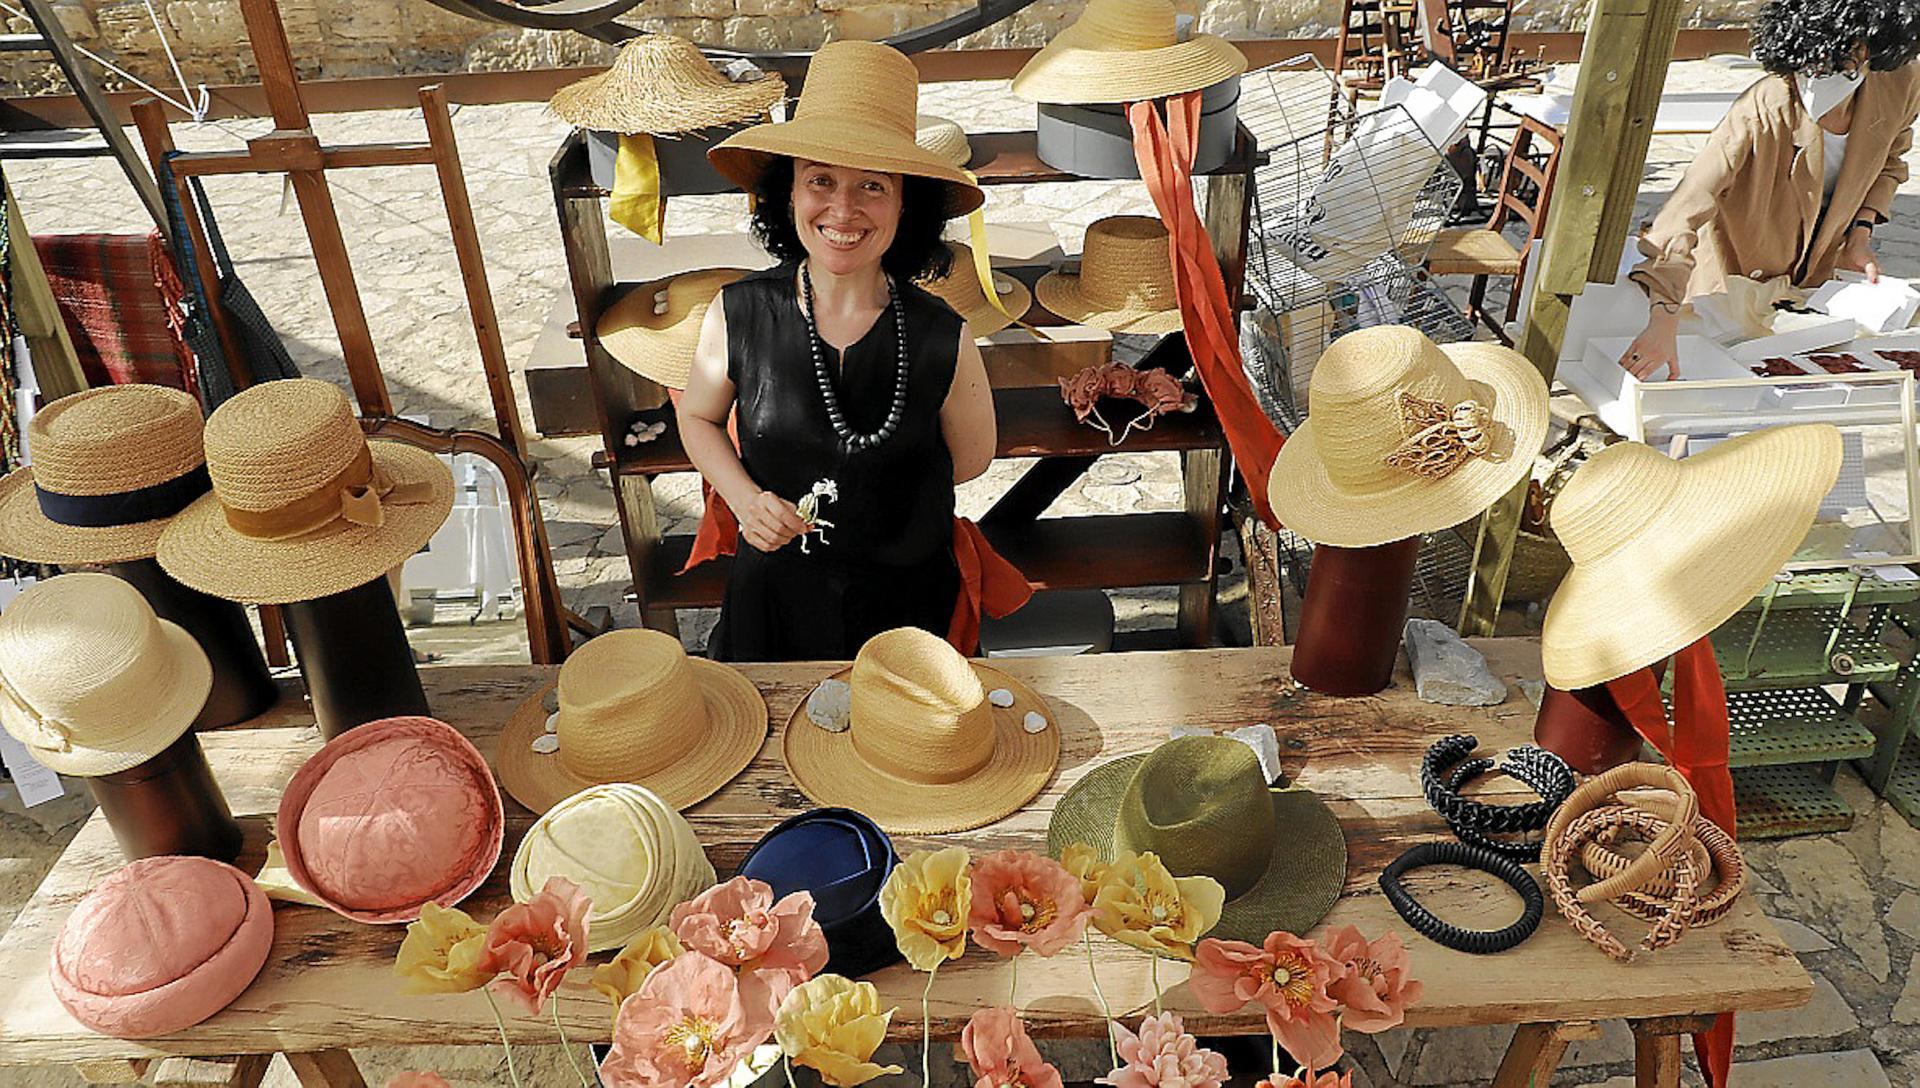 Anna Lamata at Xtant 2021 Textile Craft Exhibition.